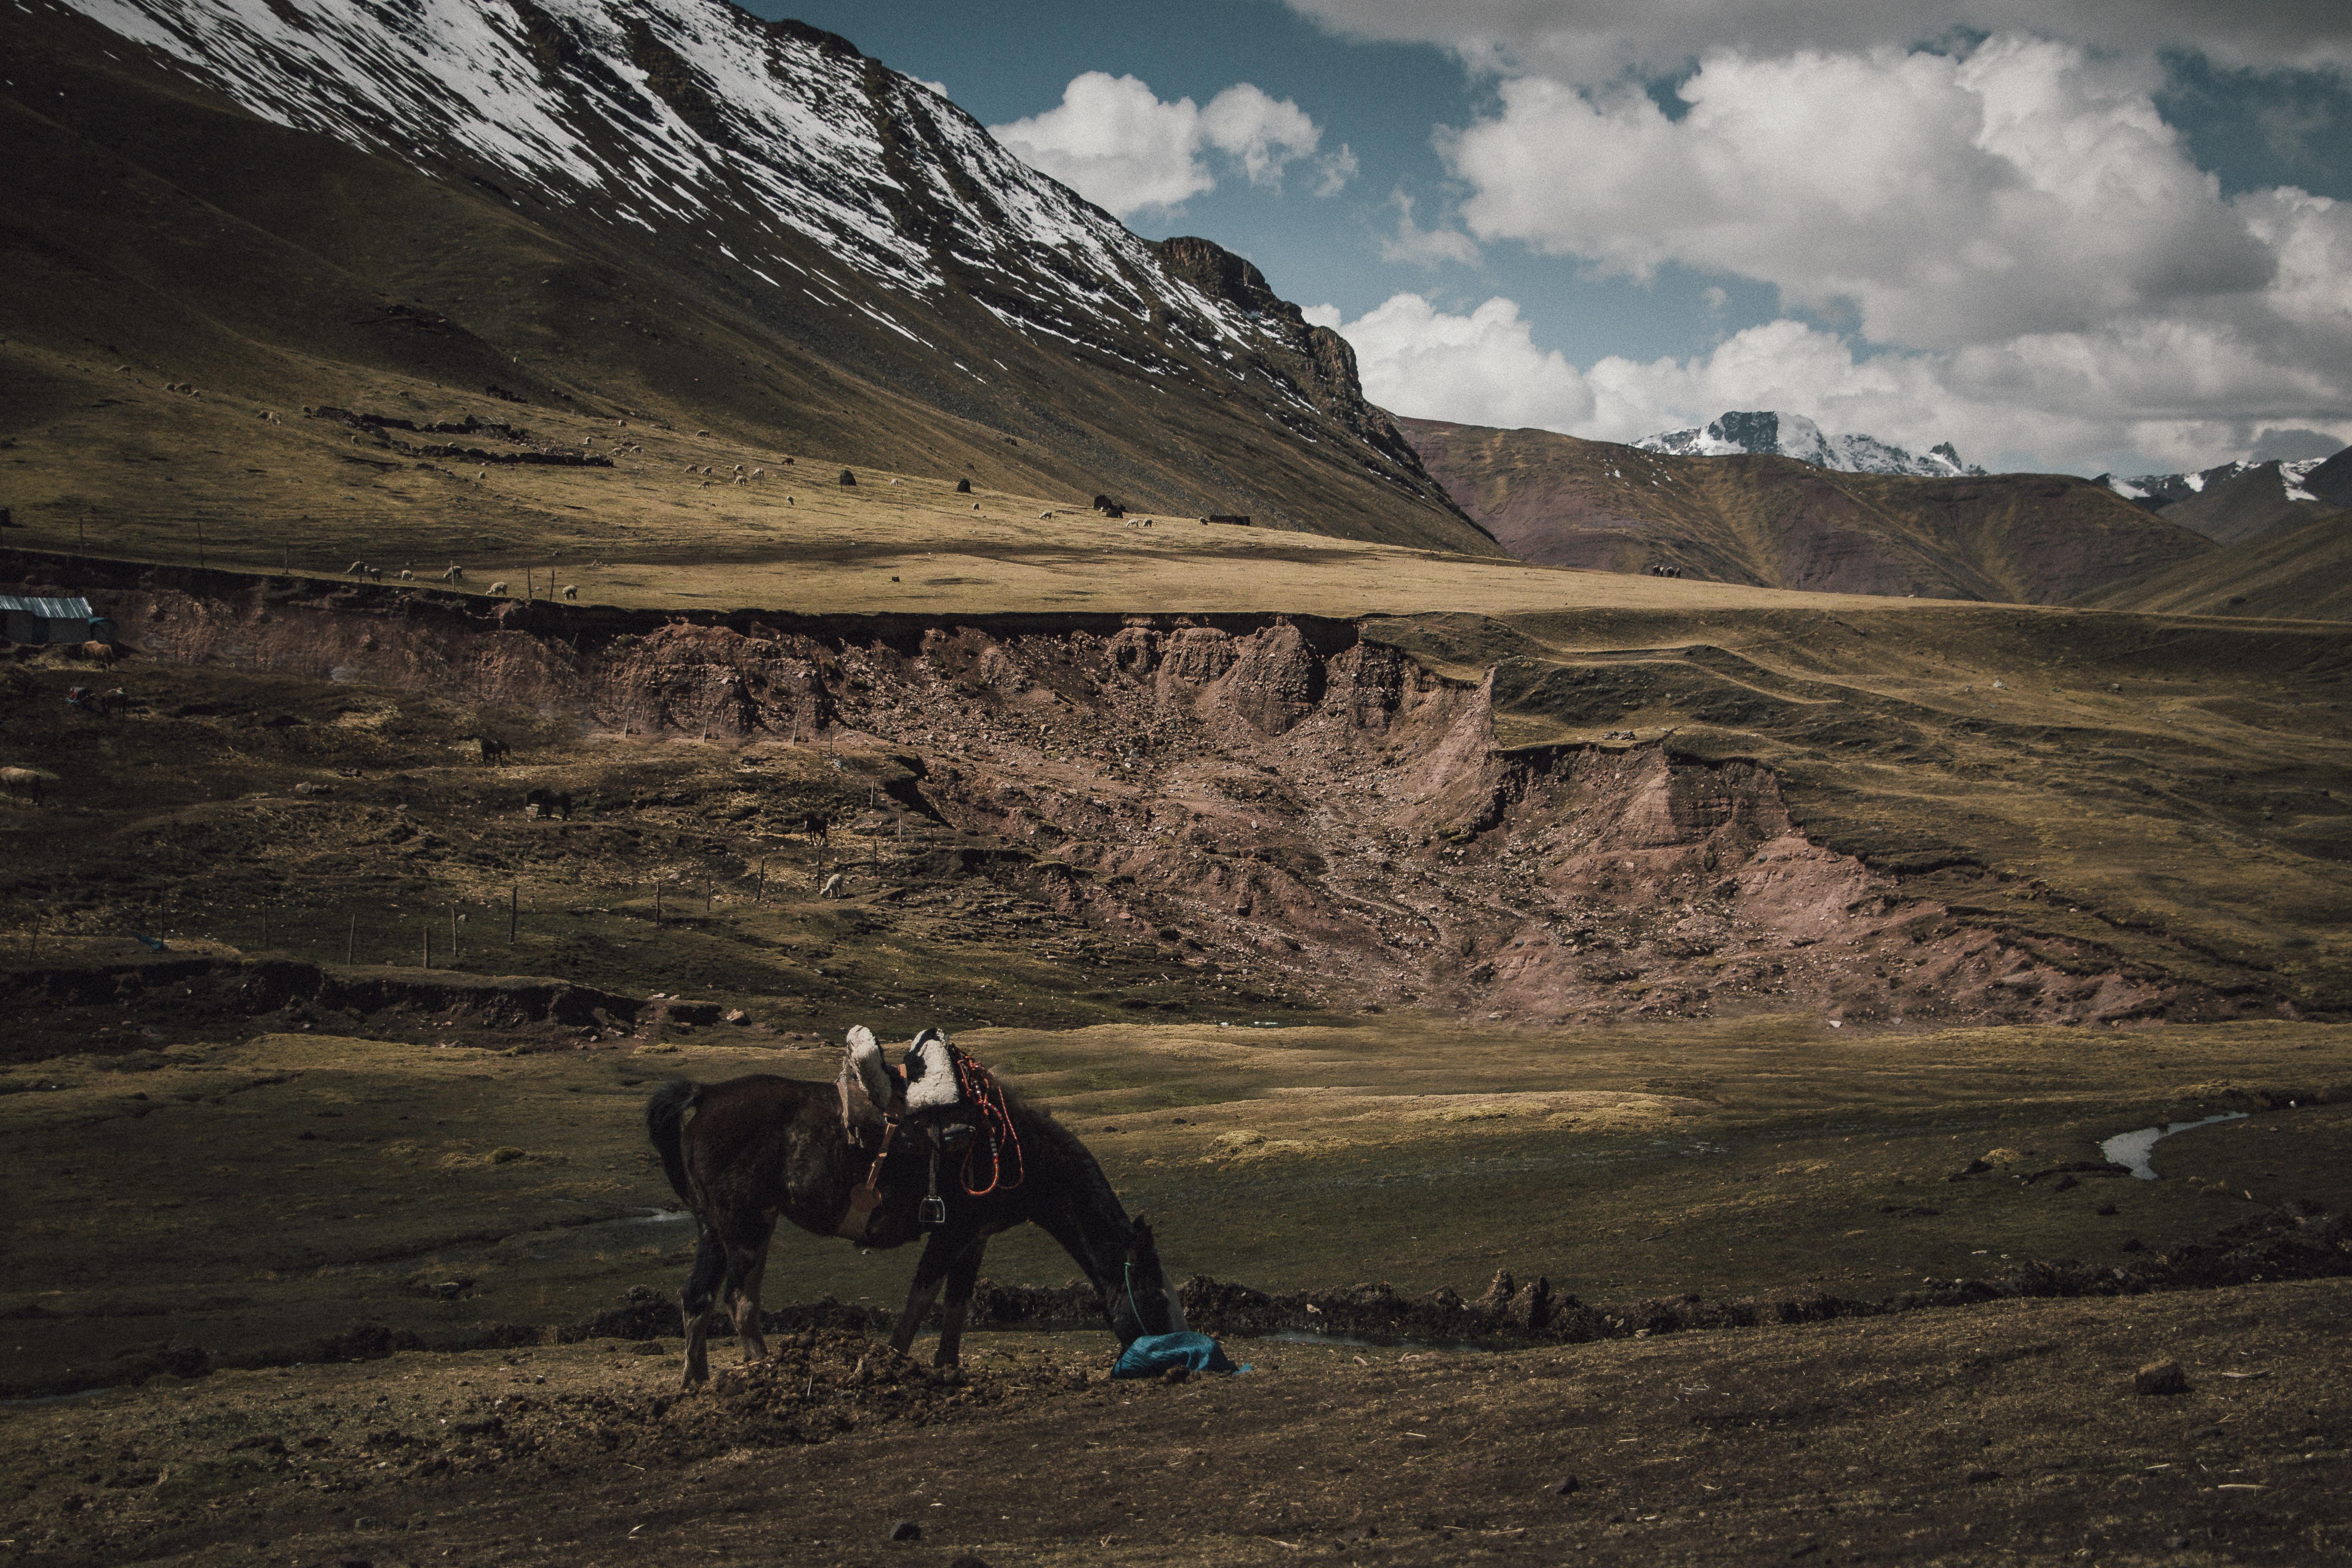 brown horse eating grass near mountains